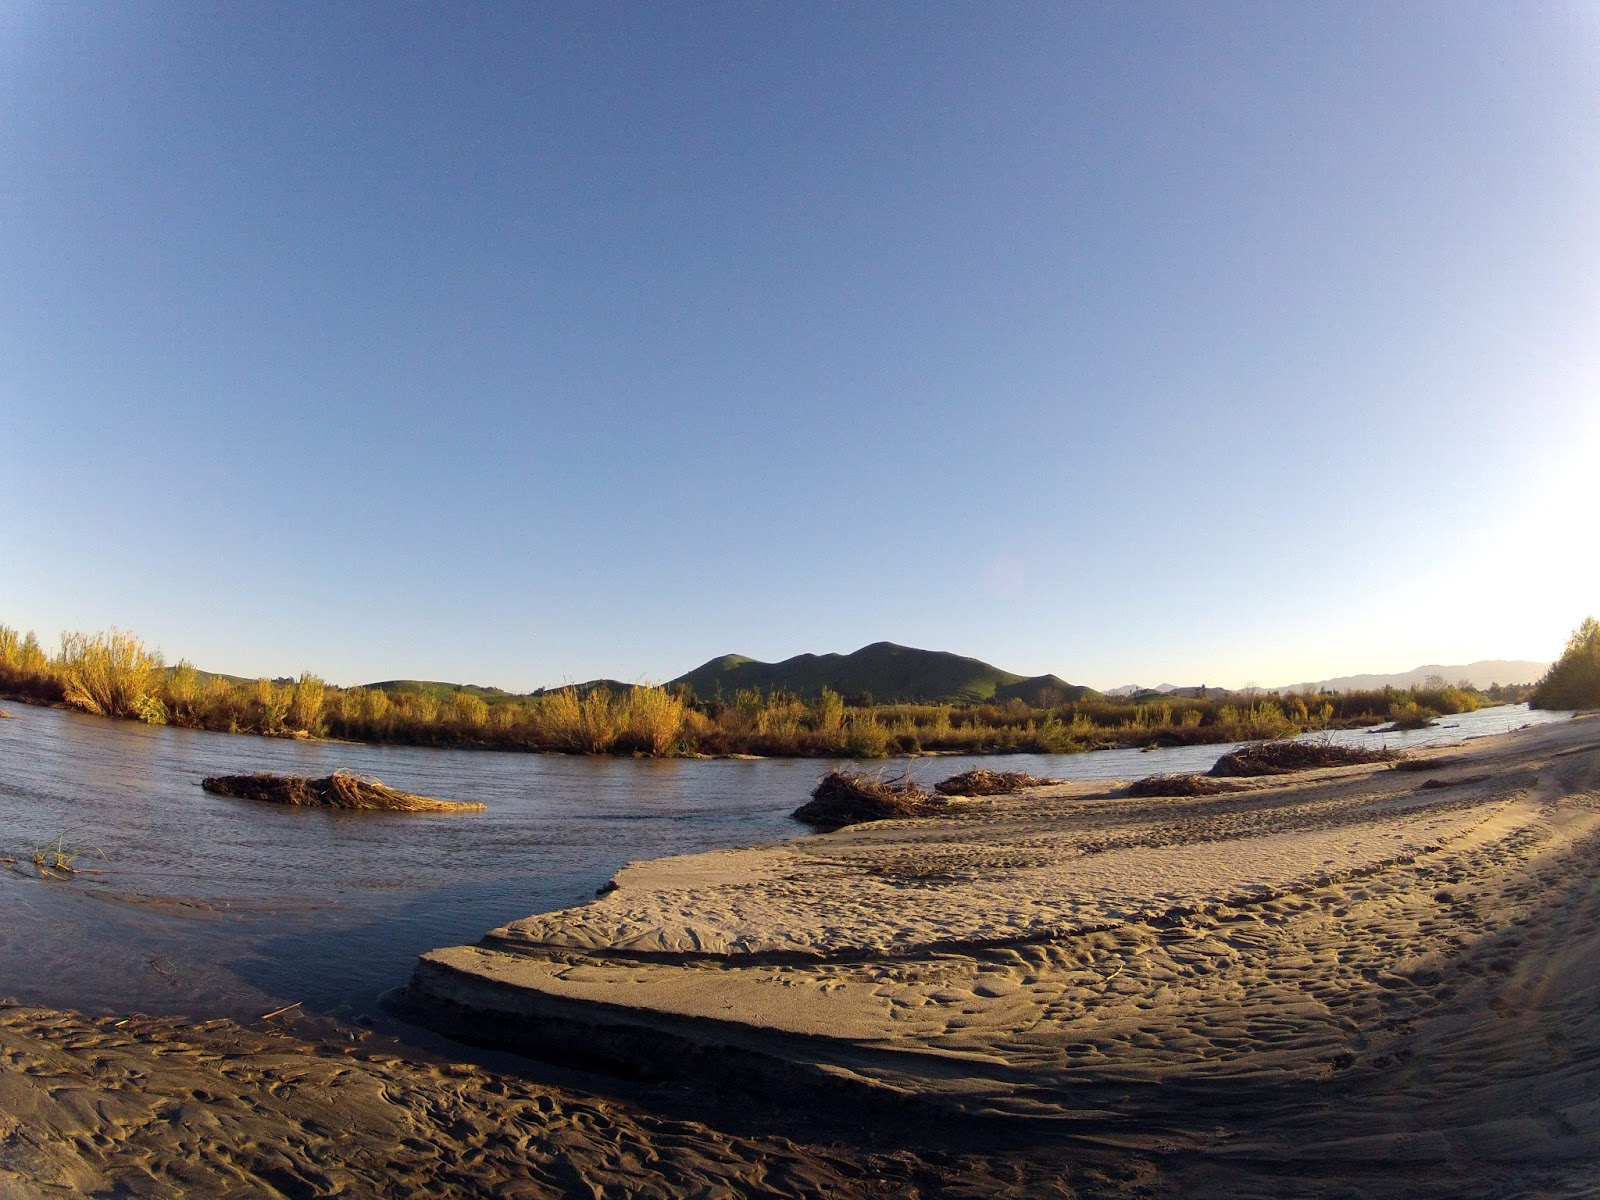 Fishing the santa ana river for bass and sunfish hunting for Santa fe dam fishing